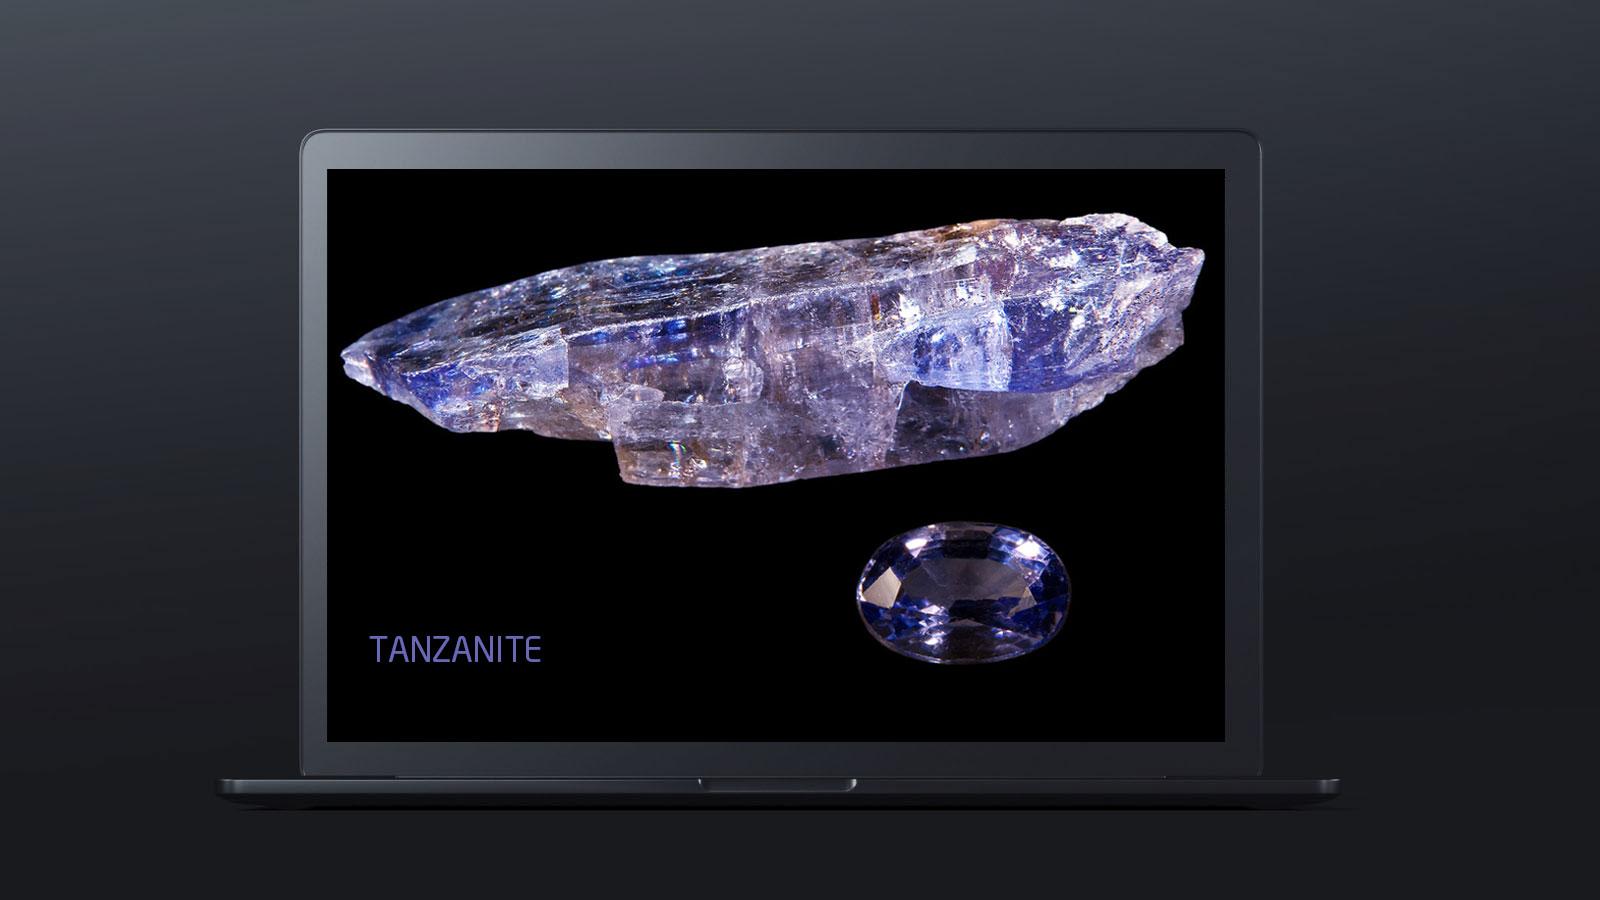 10 worlds rarest gemstones TANZANITE  - ده گوهر کمیاب دنیا کدامند؟